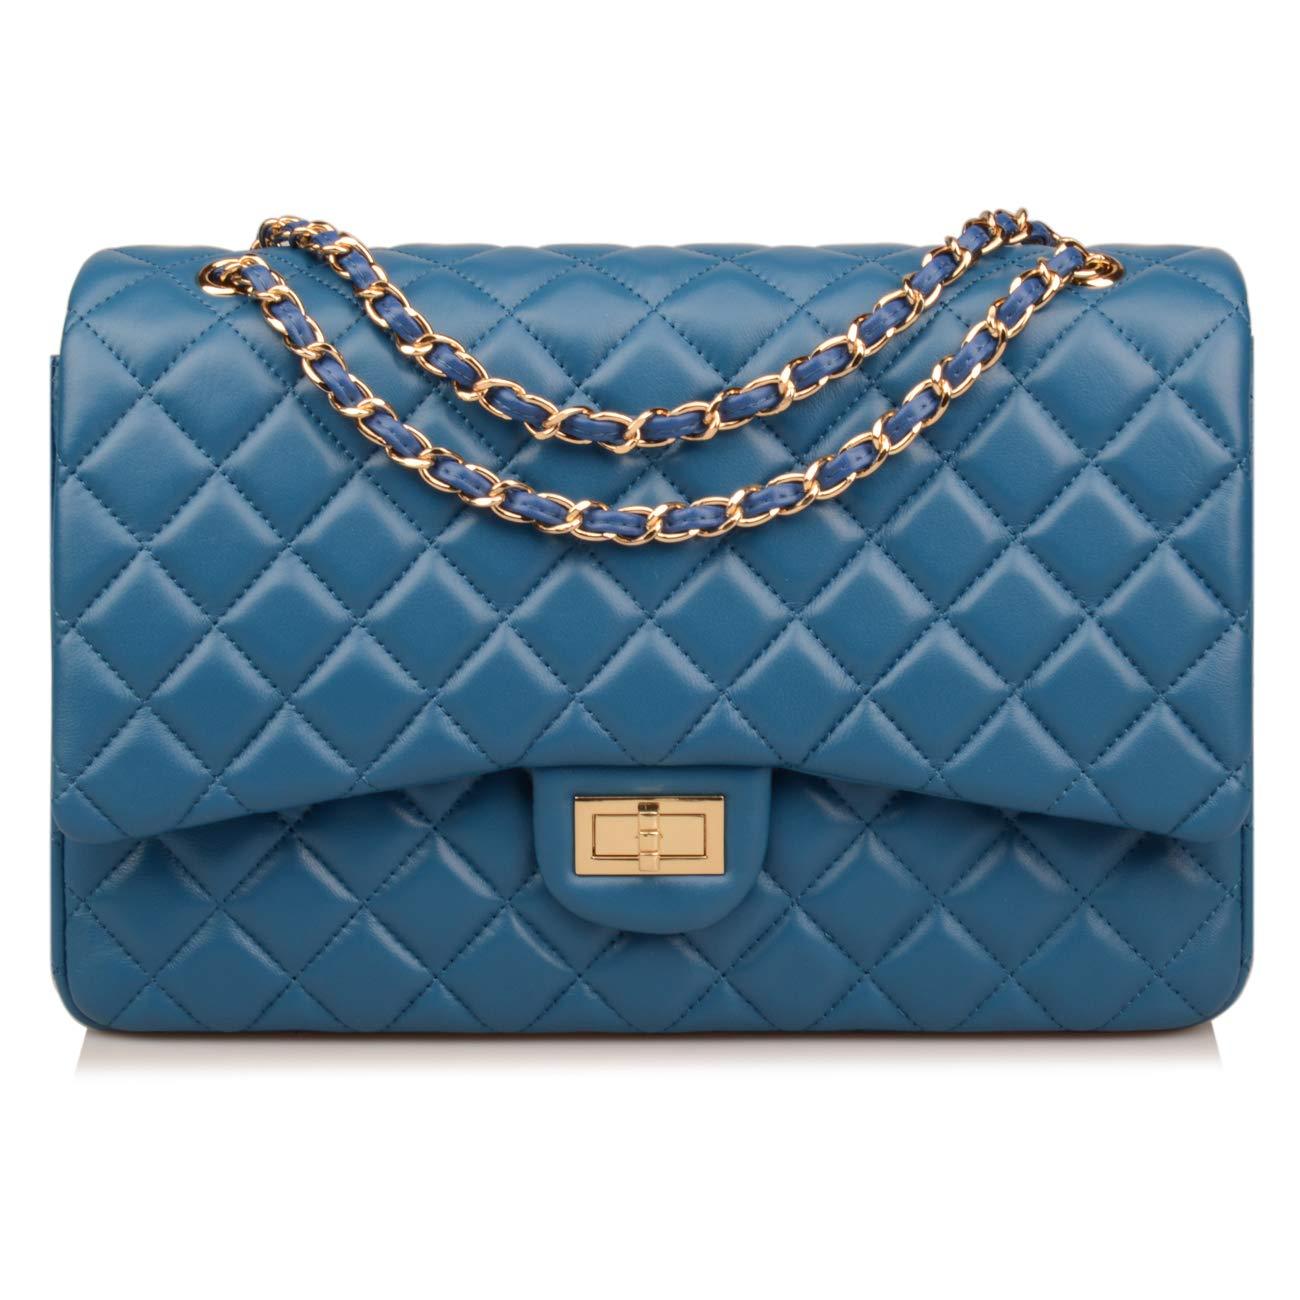 Ainifeel Women's Quilted Oversize Genuine Leather Shoulder Handbag Hobo Bag Purse